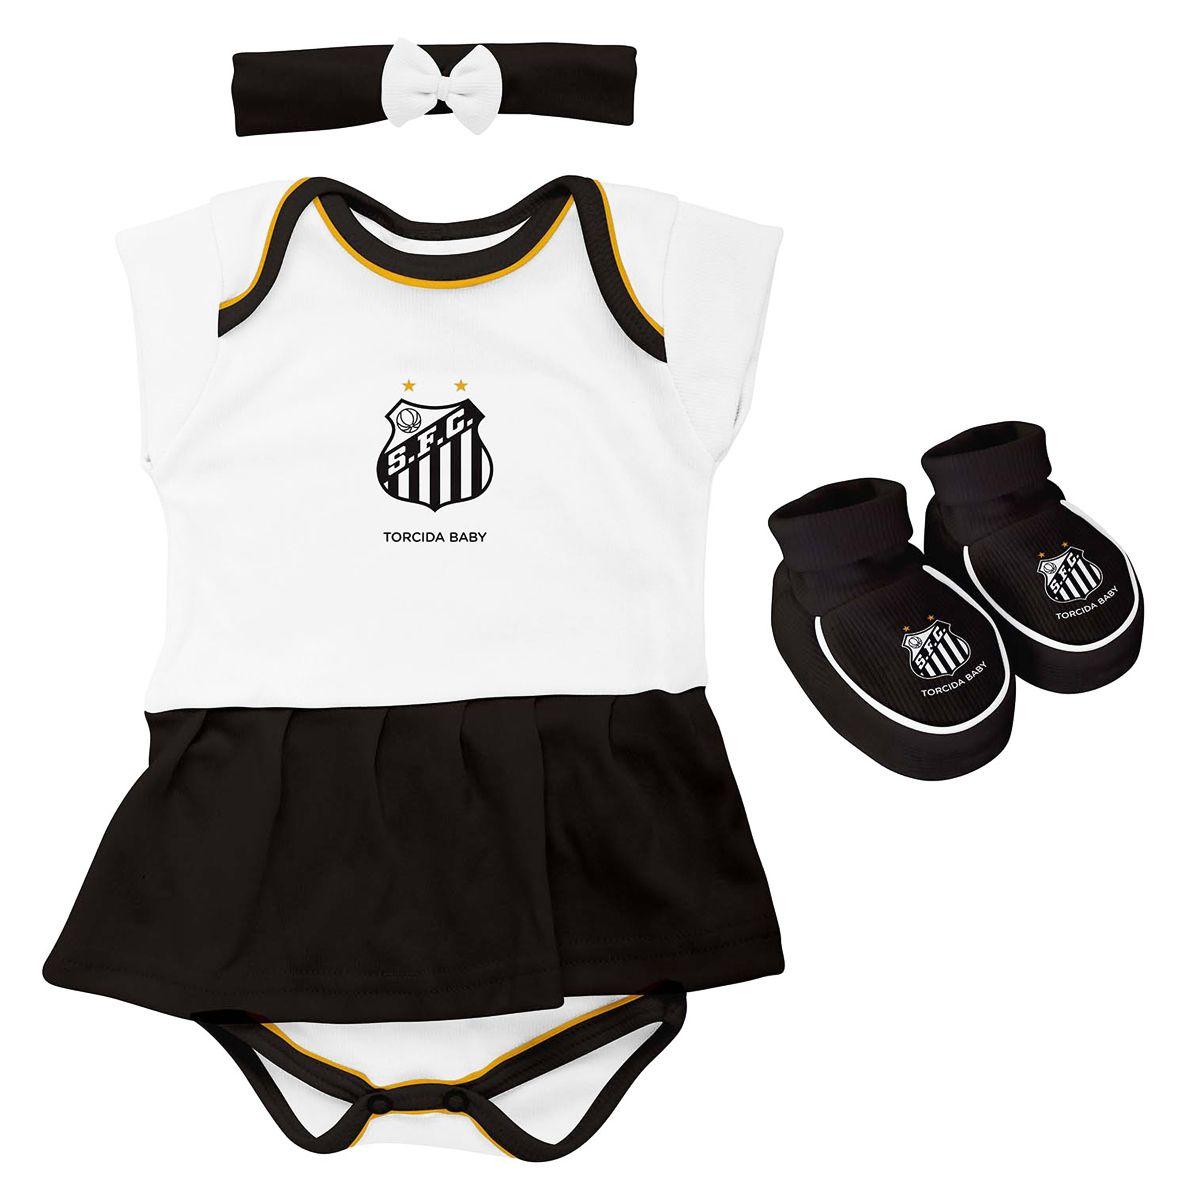 Kit 3 Peças Body Para Menina do Santos Torcida Baby - 033B